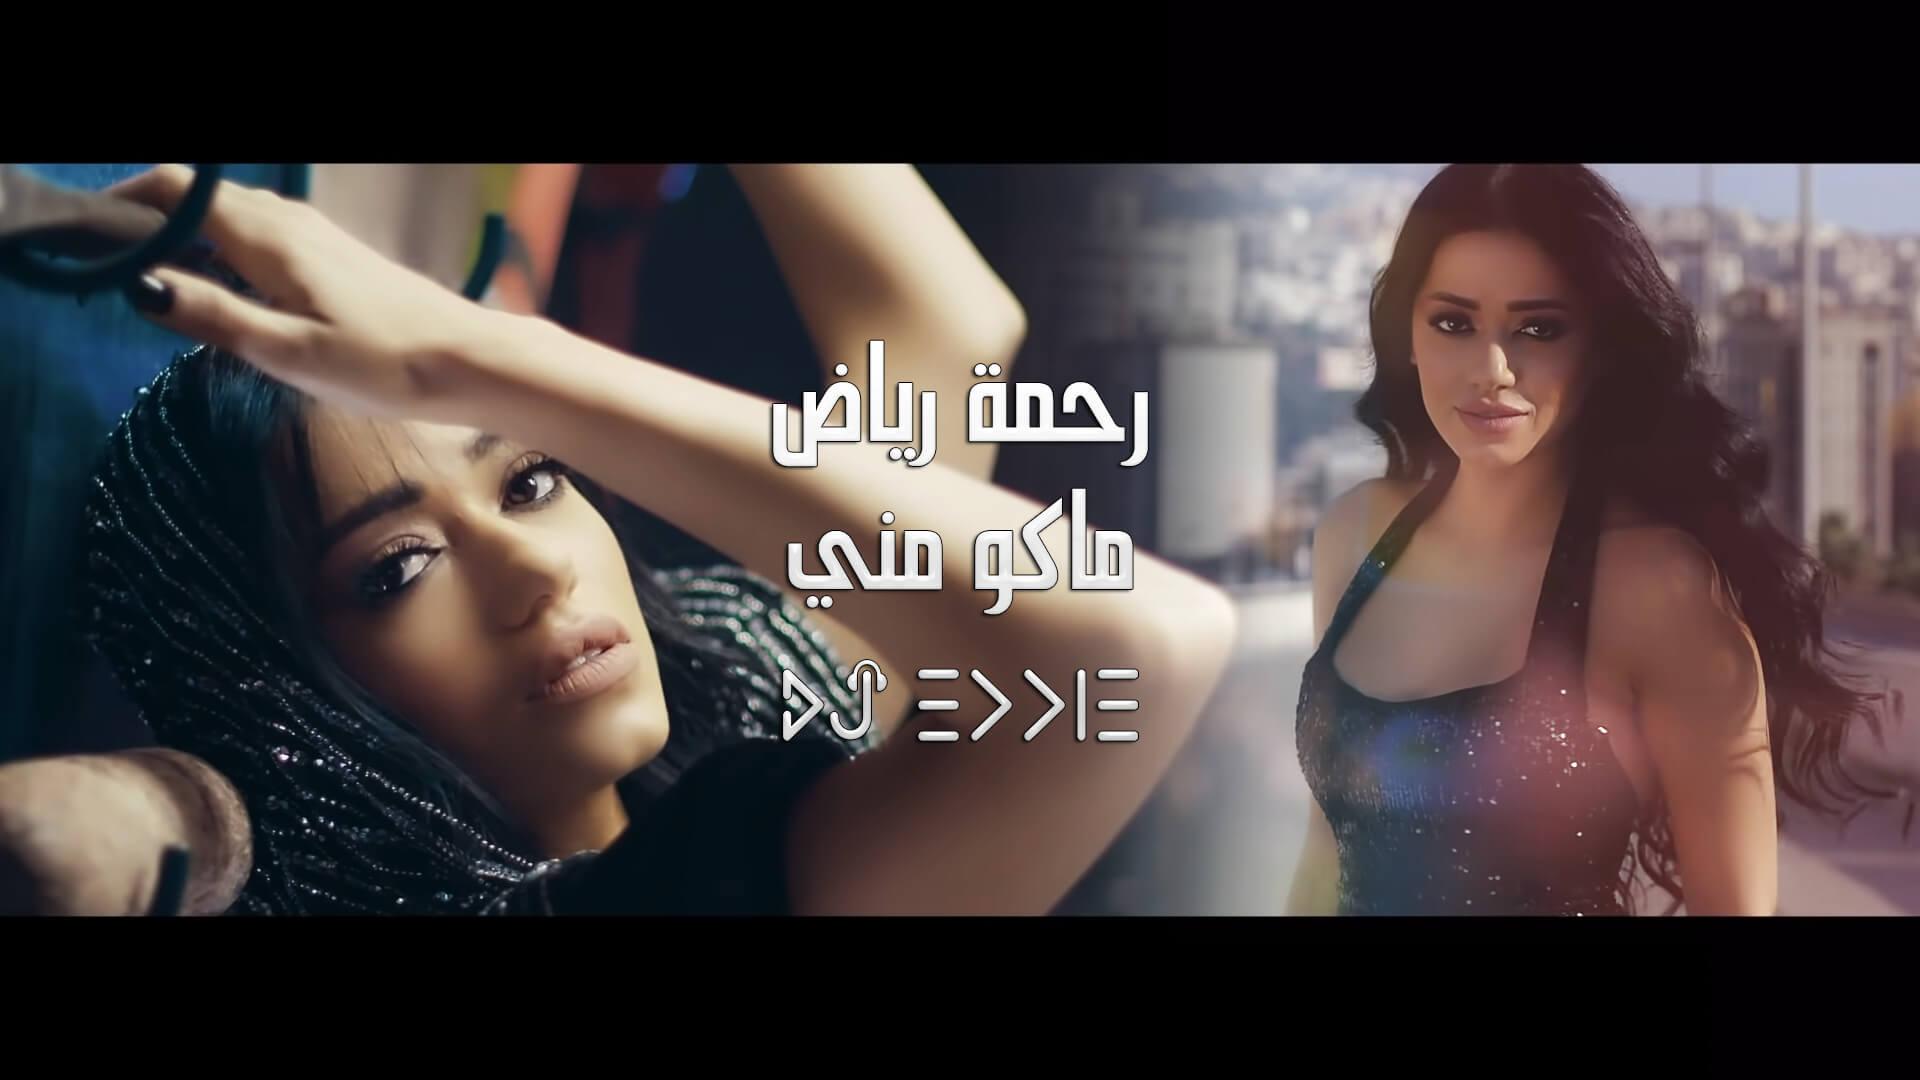 رحمة رياض - ماكو مني | Rahma Riad - Mako Menni